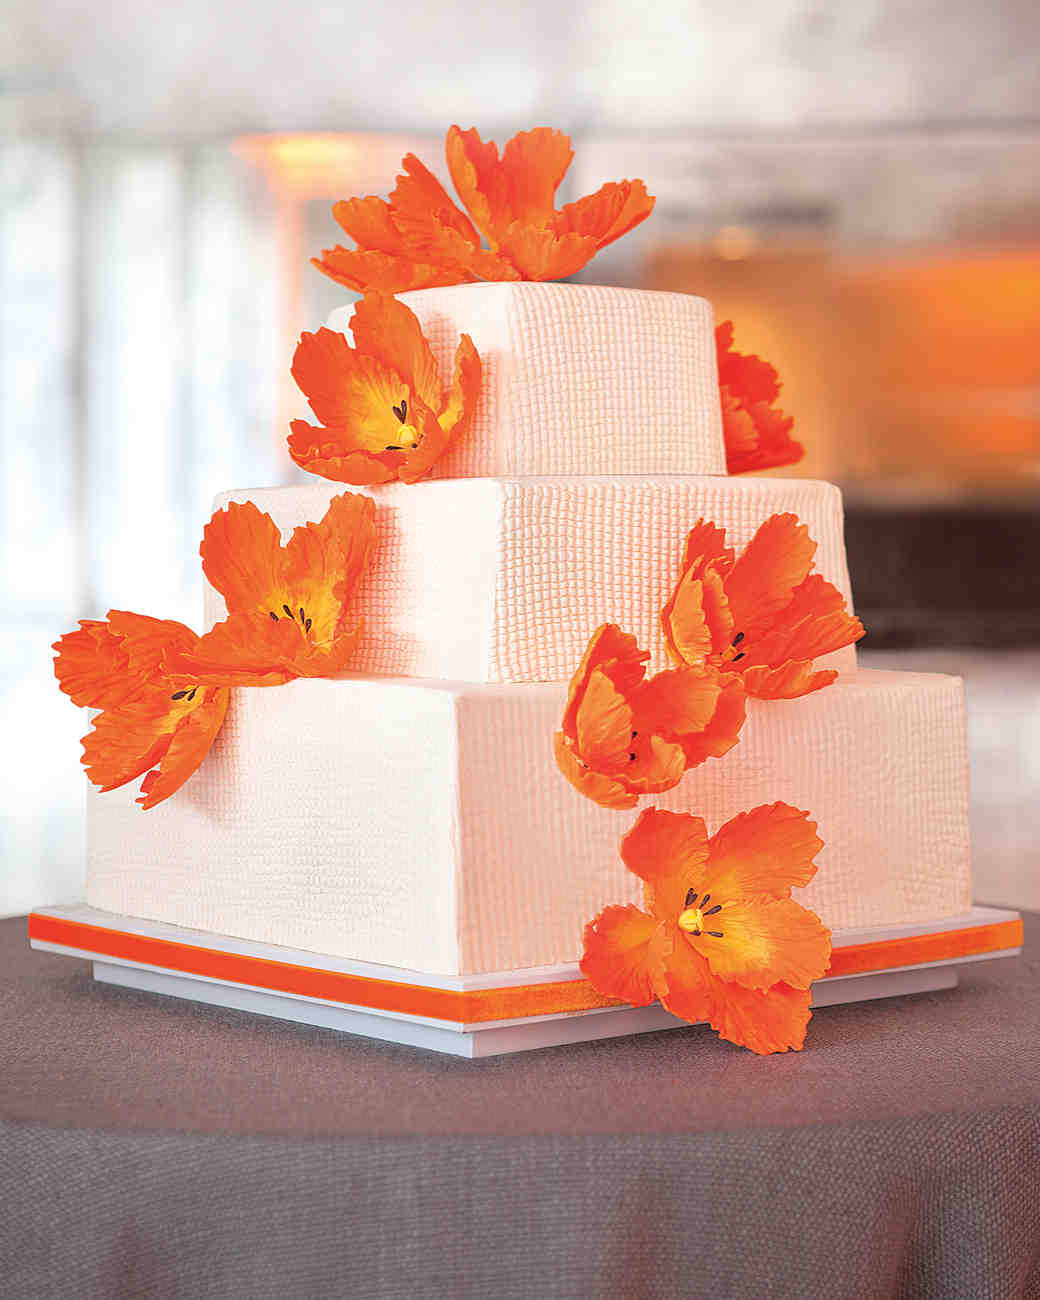 gabe-amy-cake9-015-mwd108251.jpg